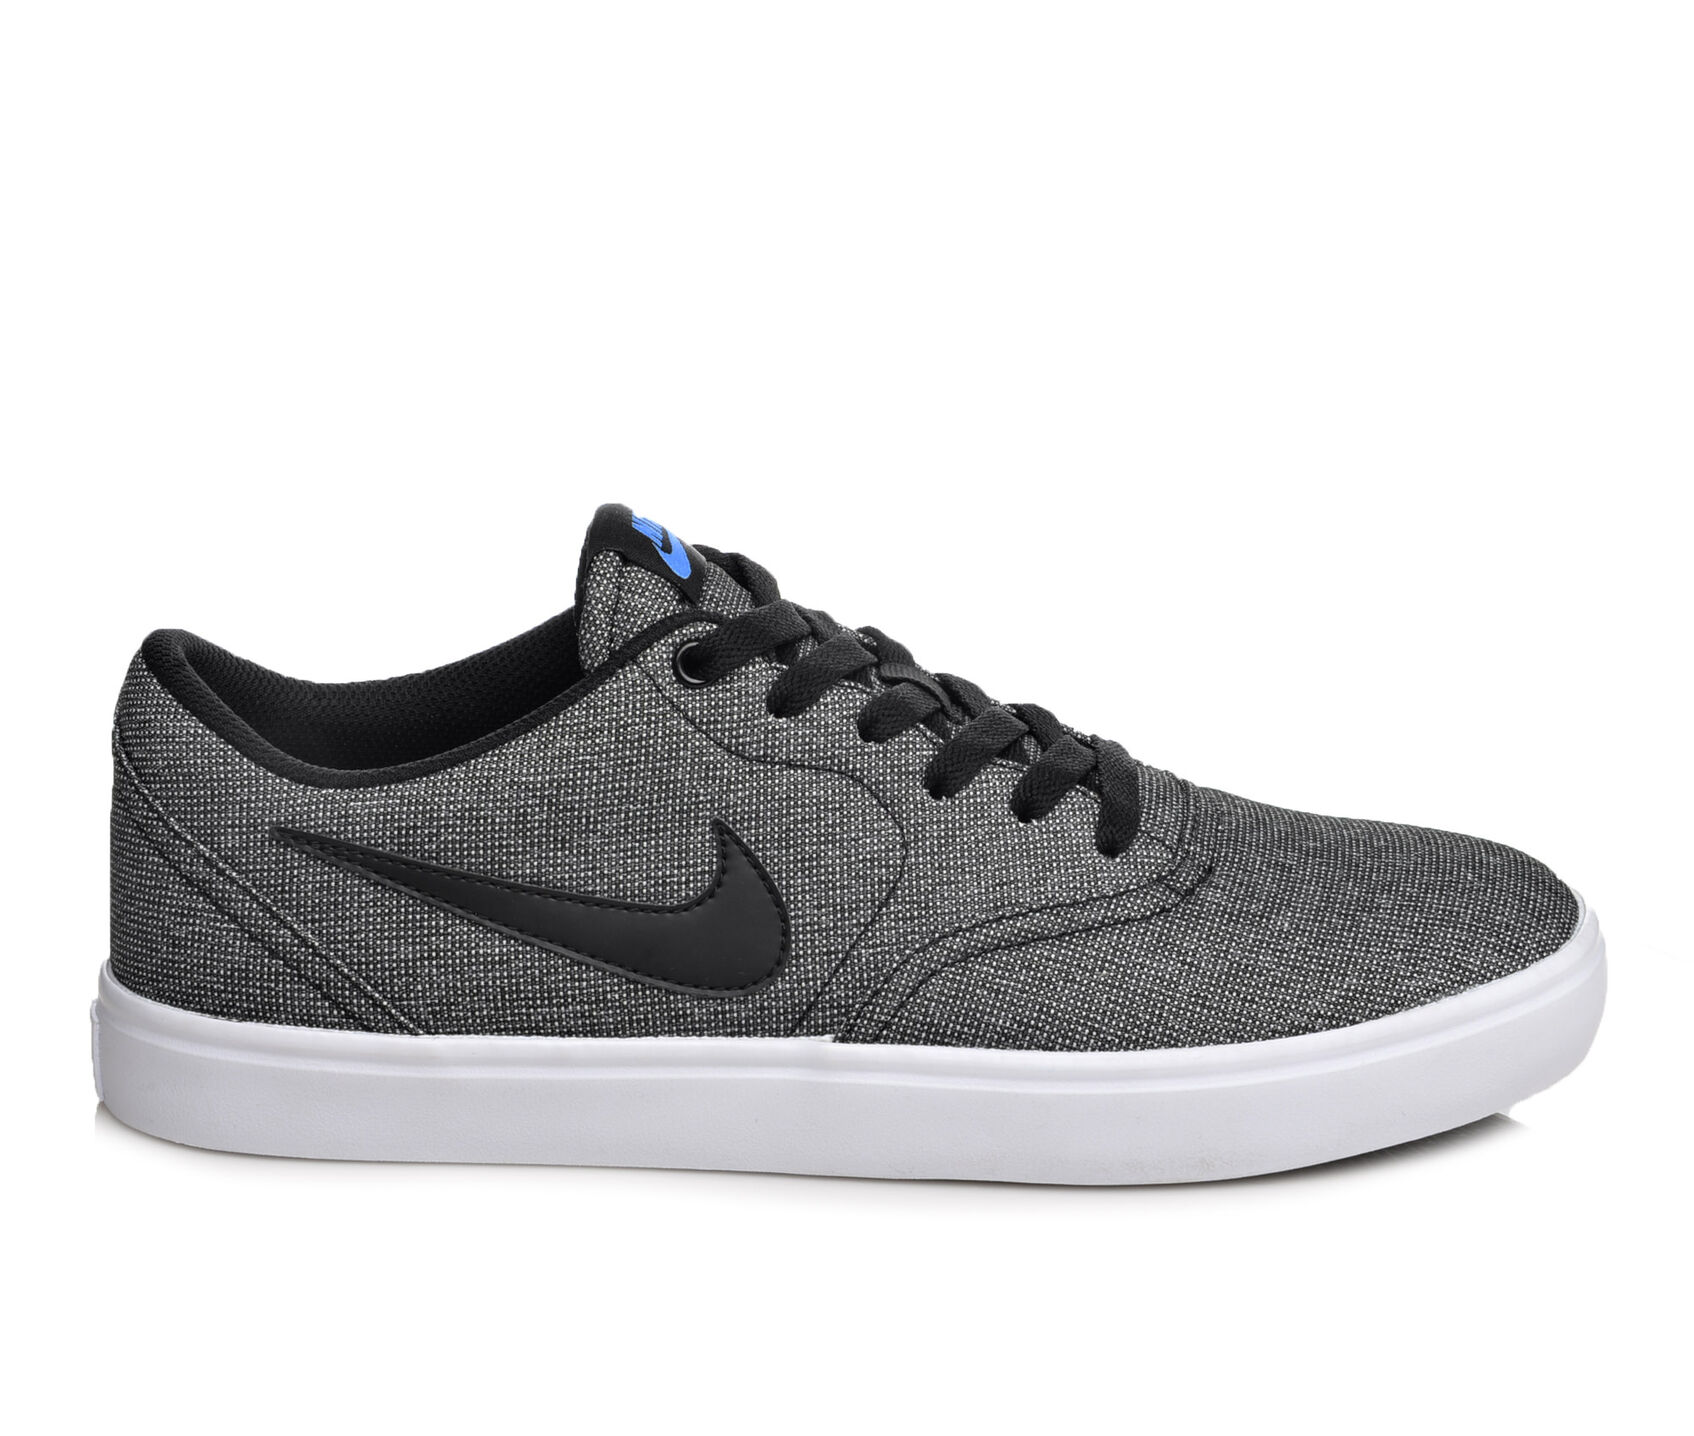 8cf595bd185dc ... Nike SB Check Solar Canvas Skate Shoes. Previous